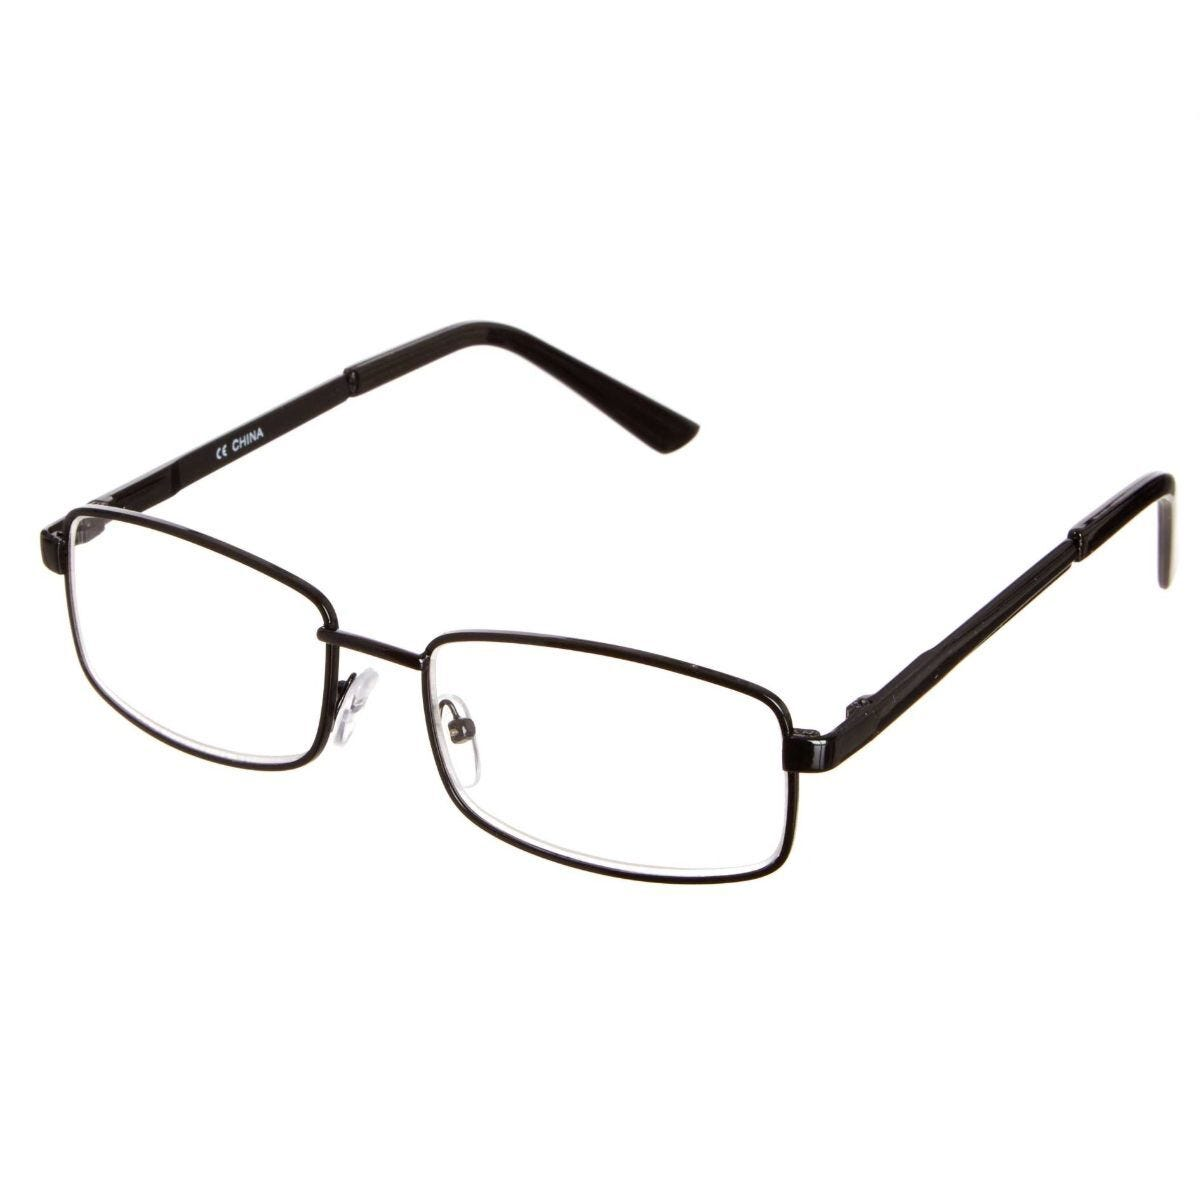 Ryman Reading Glasses + 1.5 Square Metal Frame